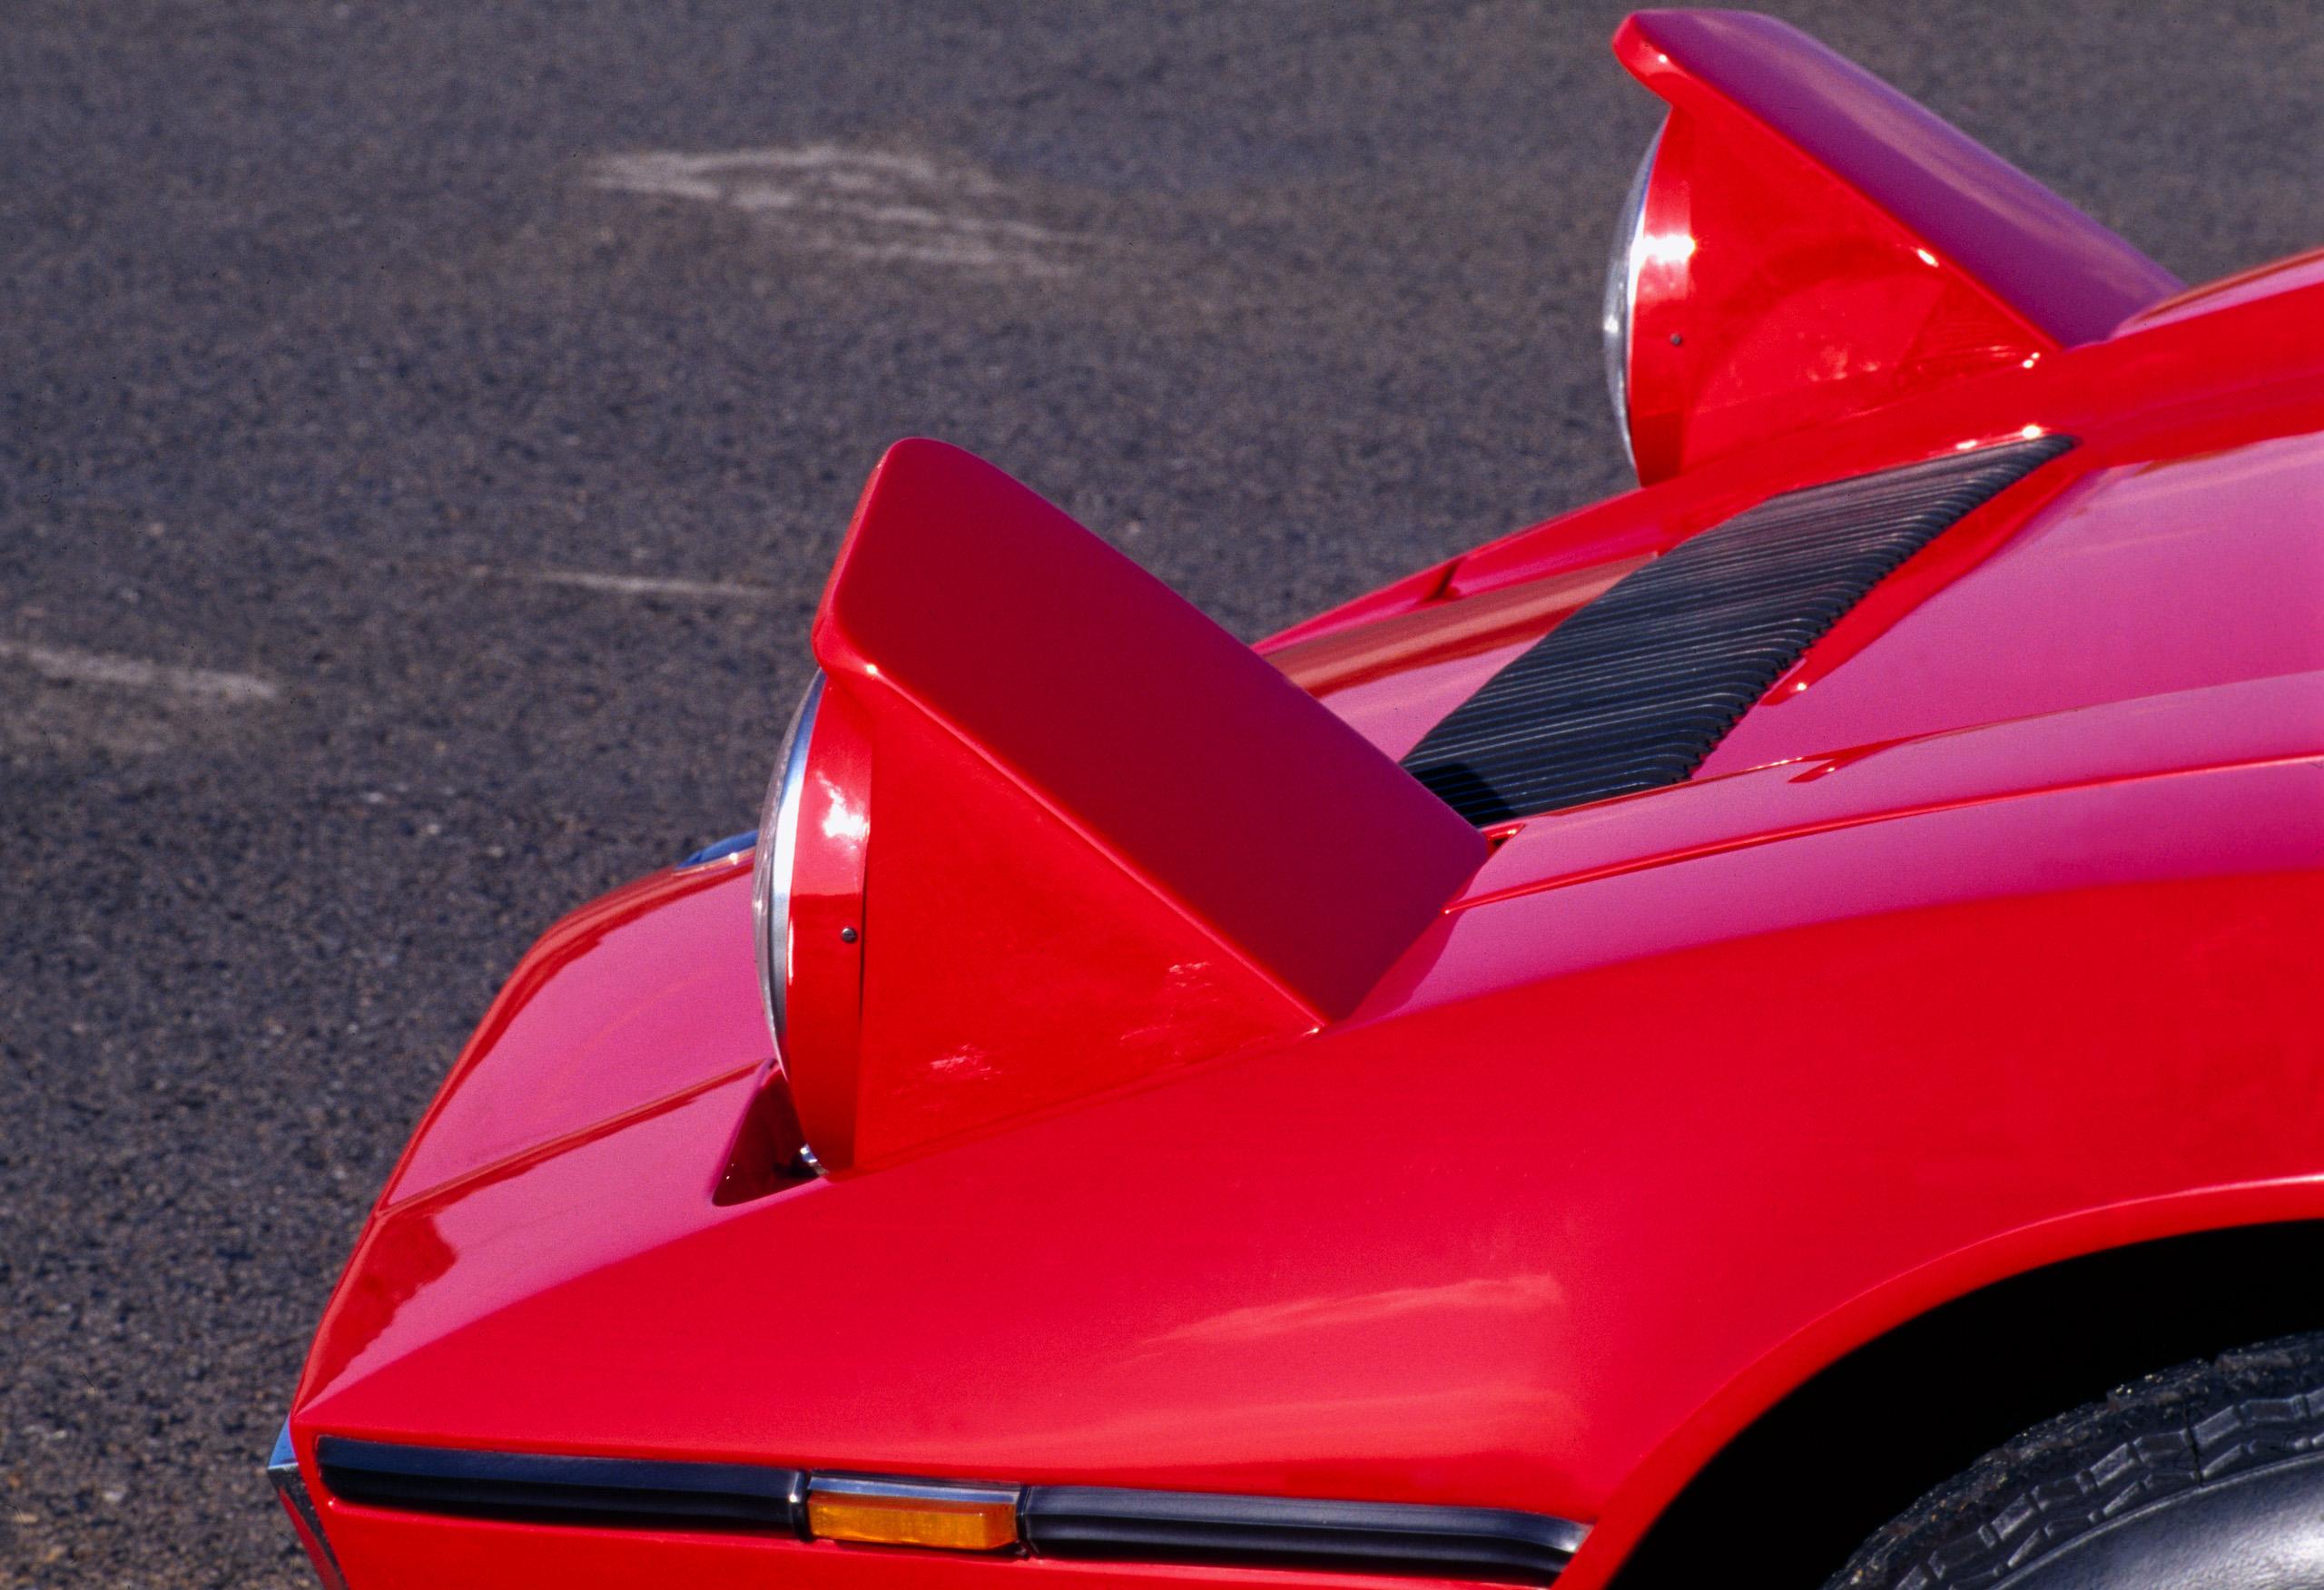 Maserati Bora front pop up headlights